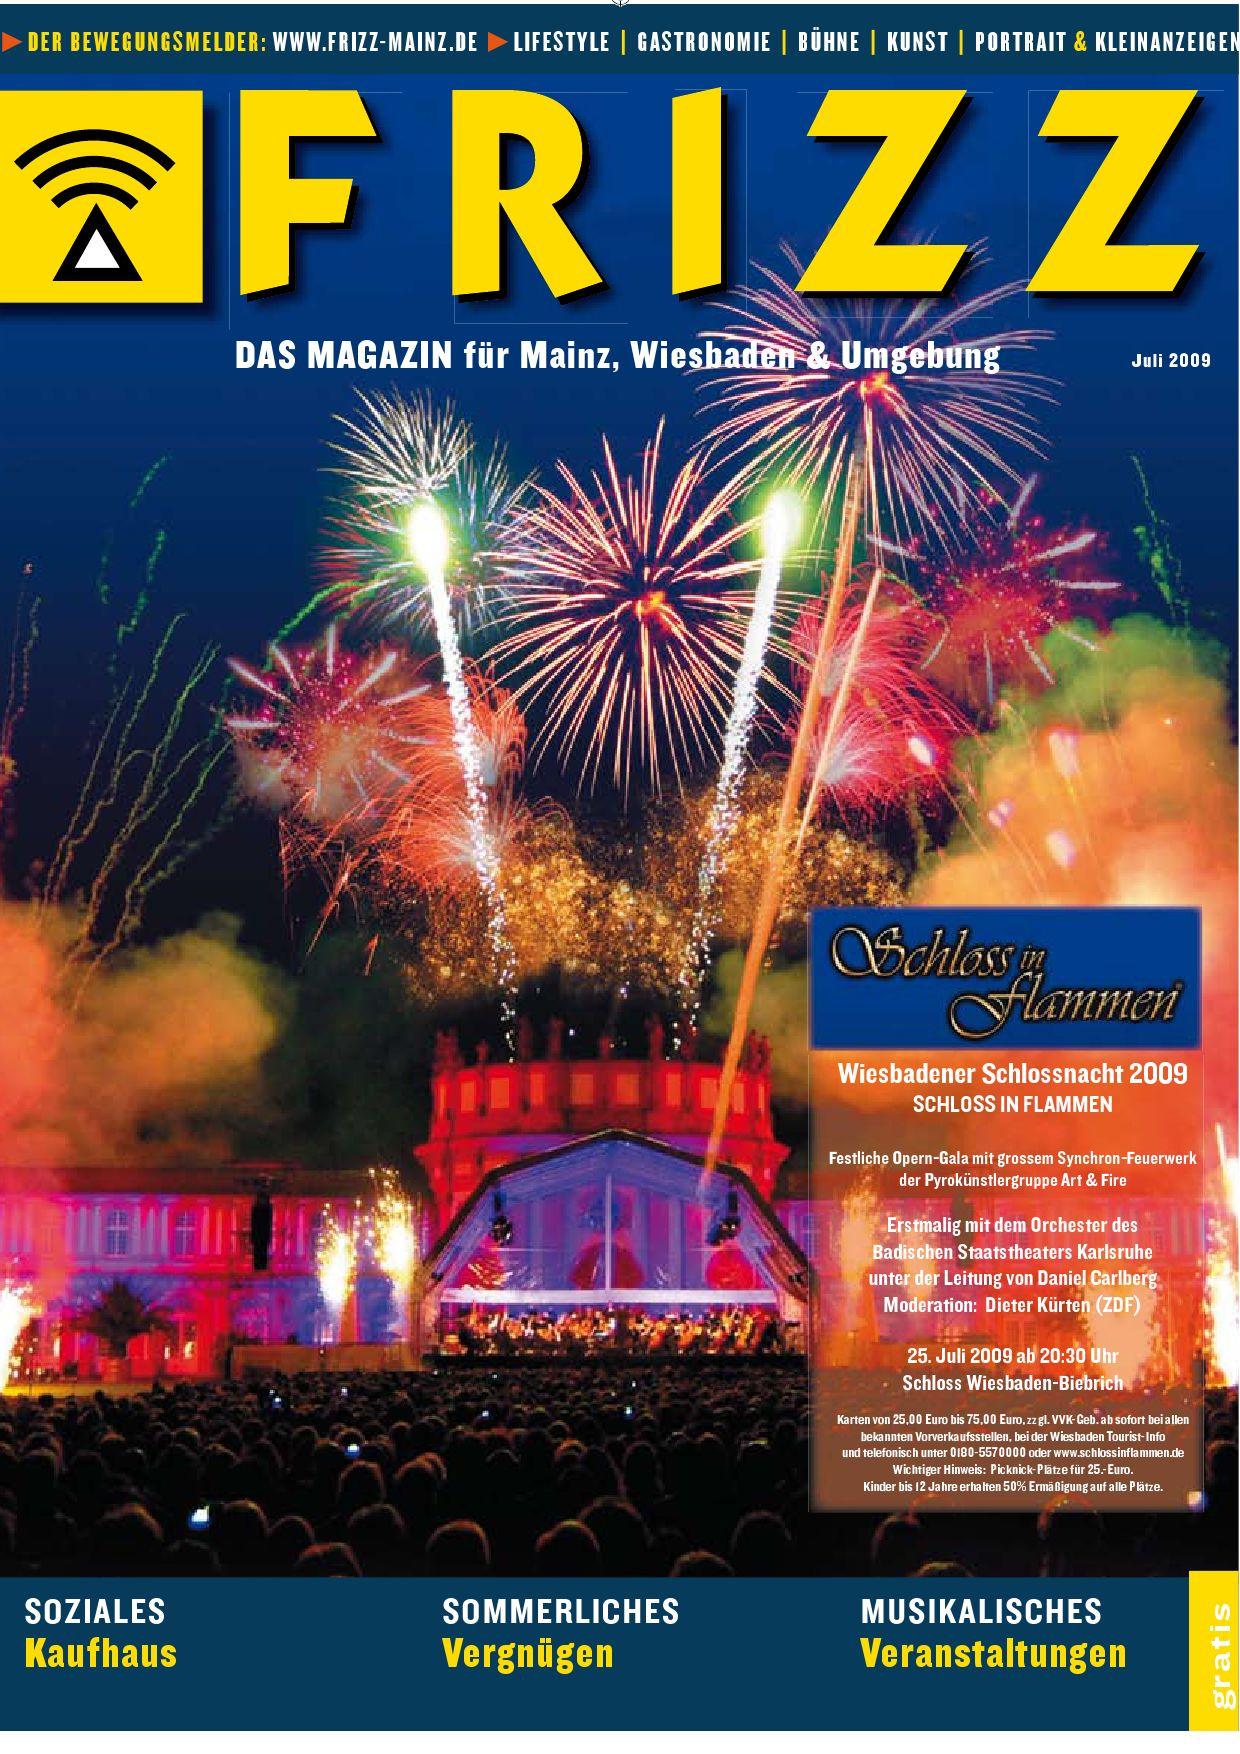 FRIZZ Das Magazin für Mainz Wiesbaden & Umgebung Ausgabe 07 2009 by Stadtmagazin issuu